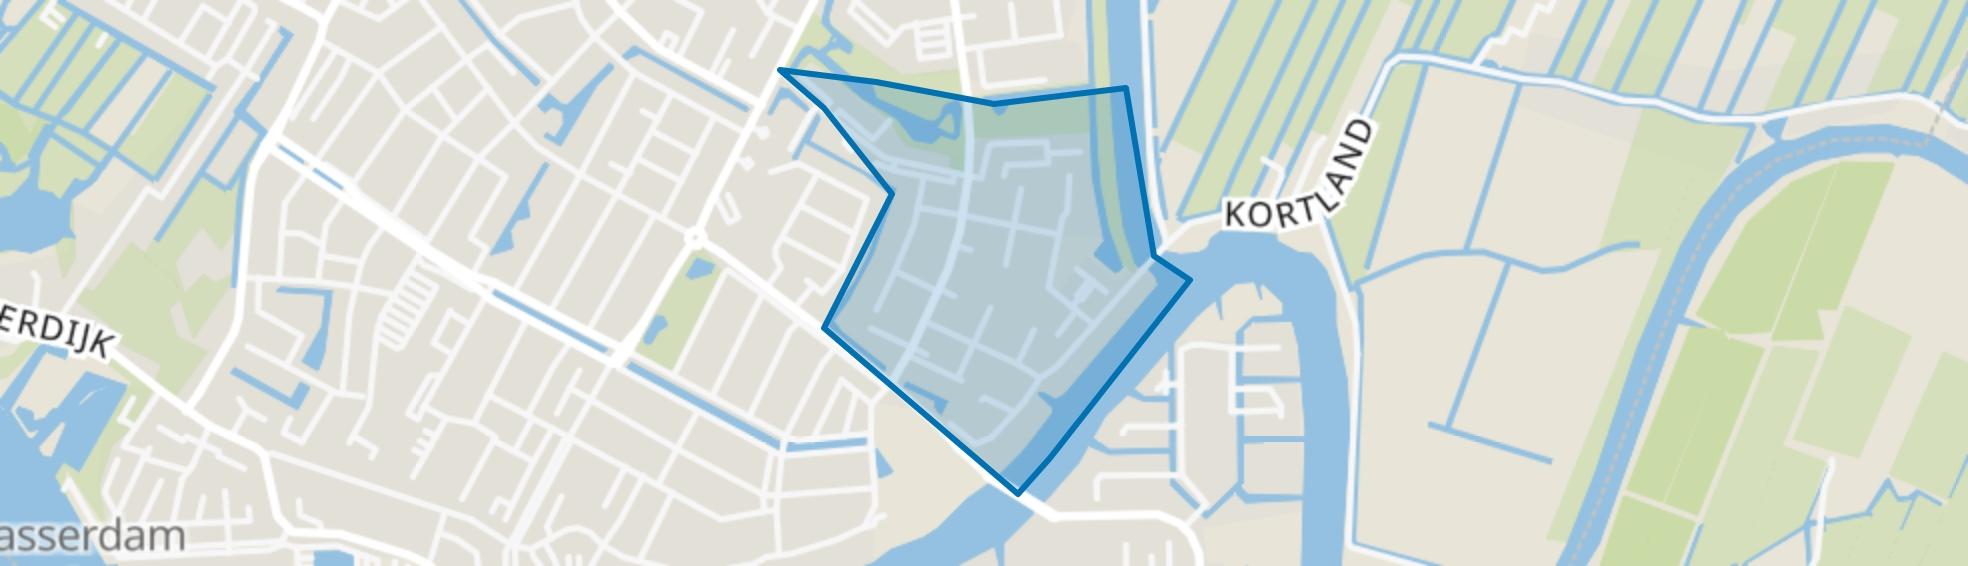 Schrijversbuurt, Alblasserdam map